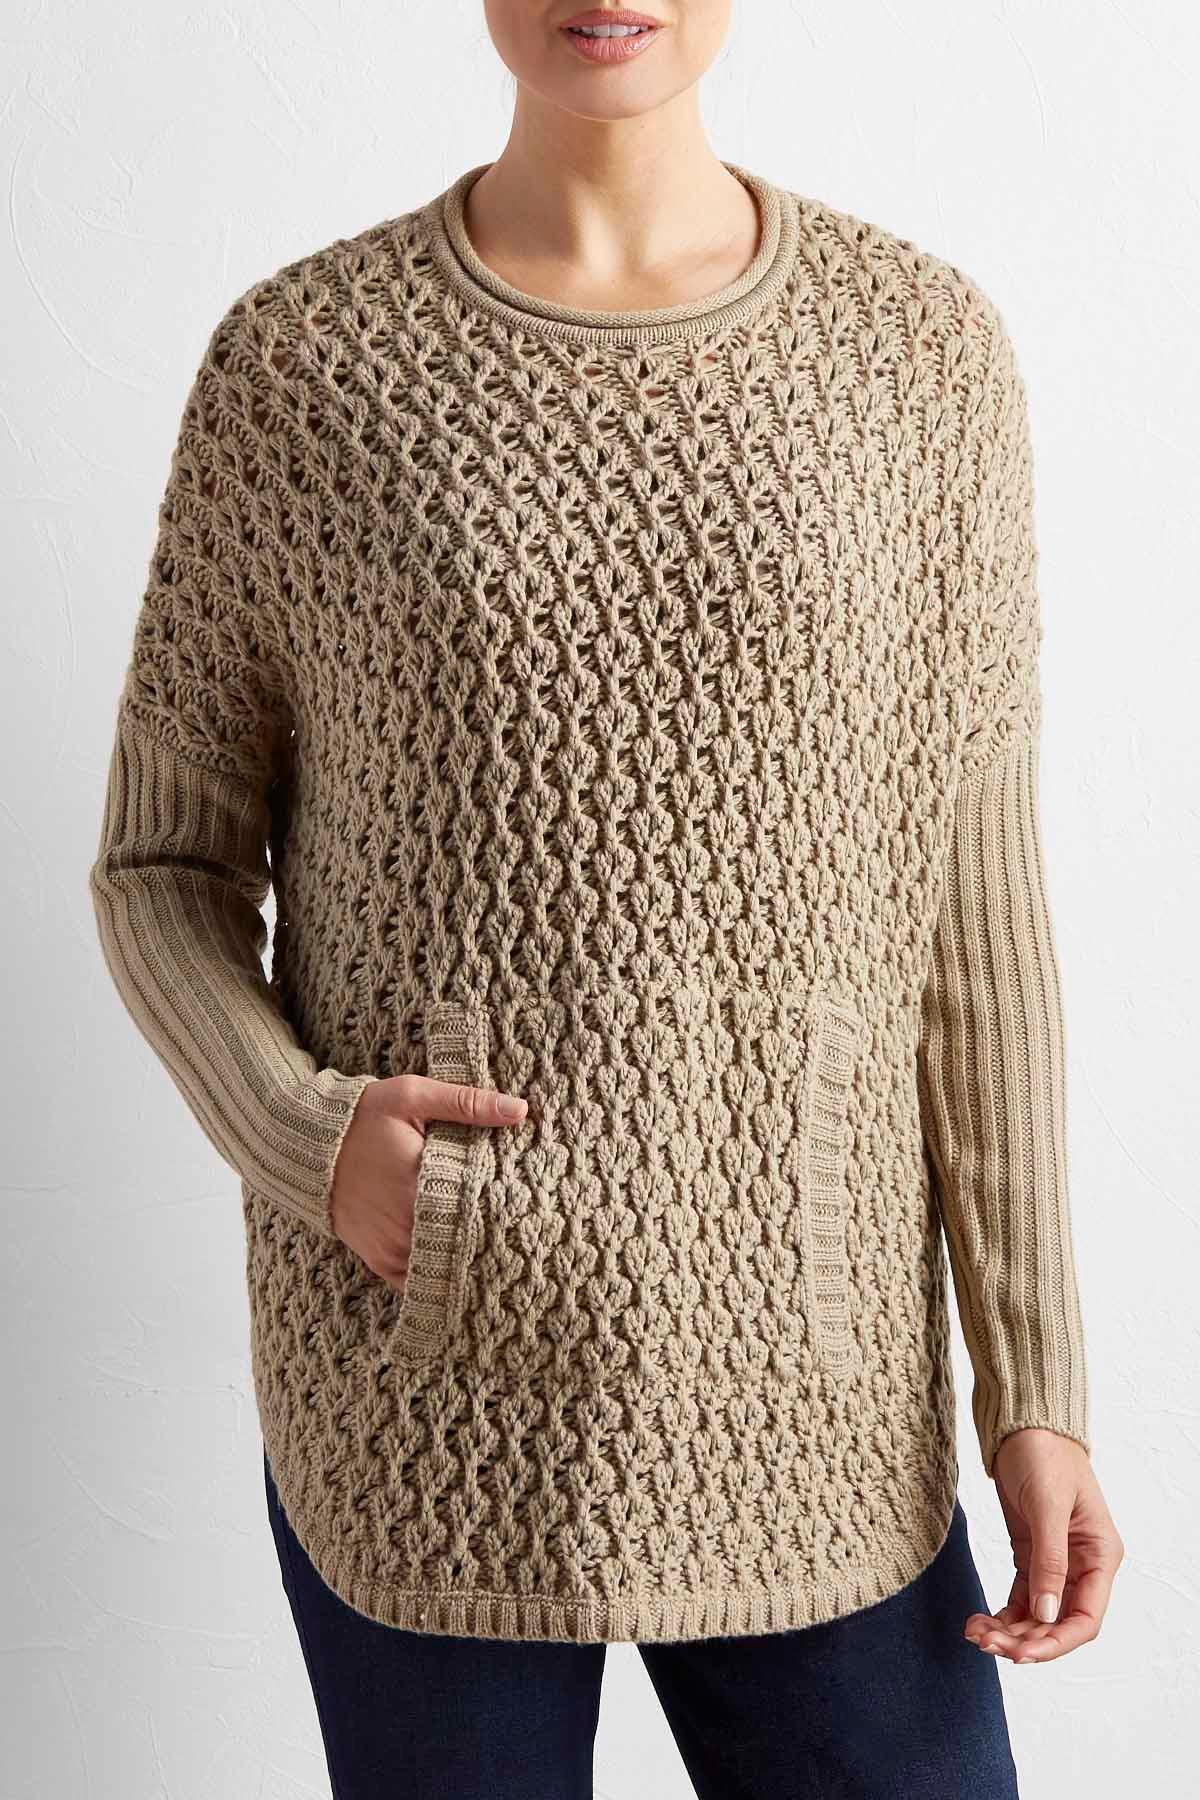 Ribbed Sleeve Kangaroo Pocket Sweater